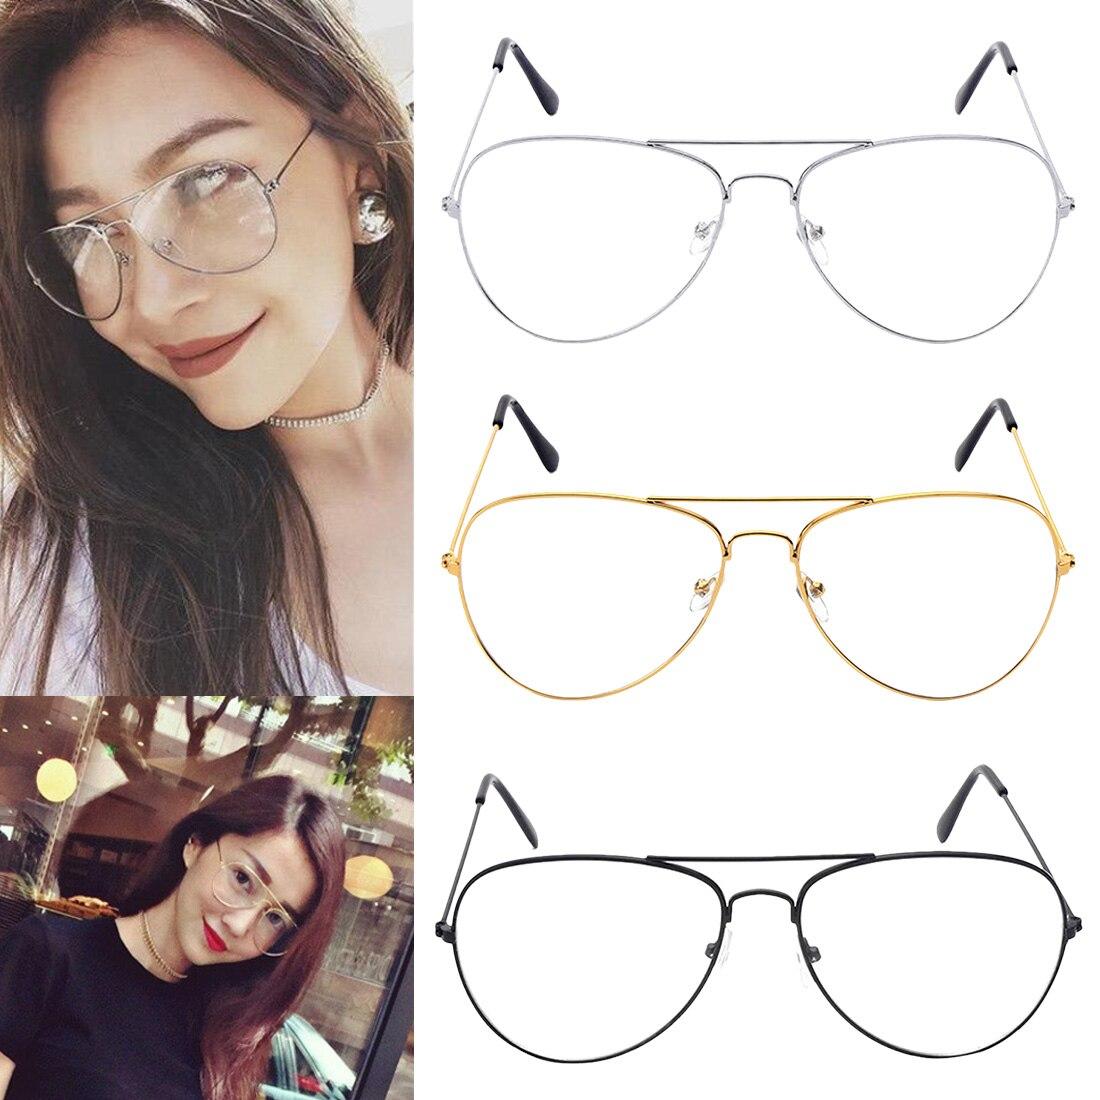 1 Pcs Große Mode Retro Metall Klare Linse Gläser Designer Tear Drop Rahmen Brillen De Oculos Feminino Lunette De Vue